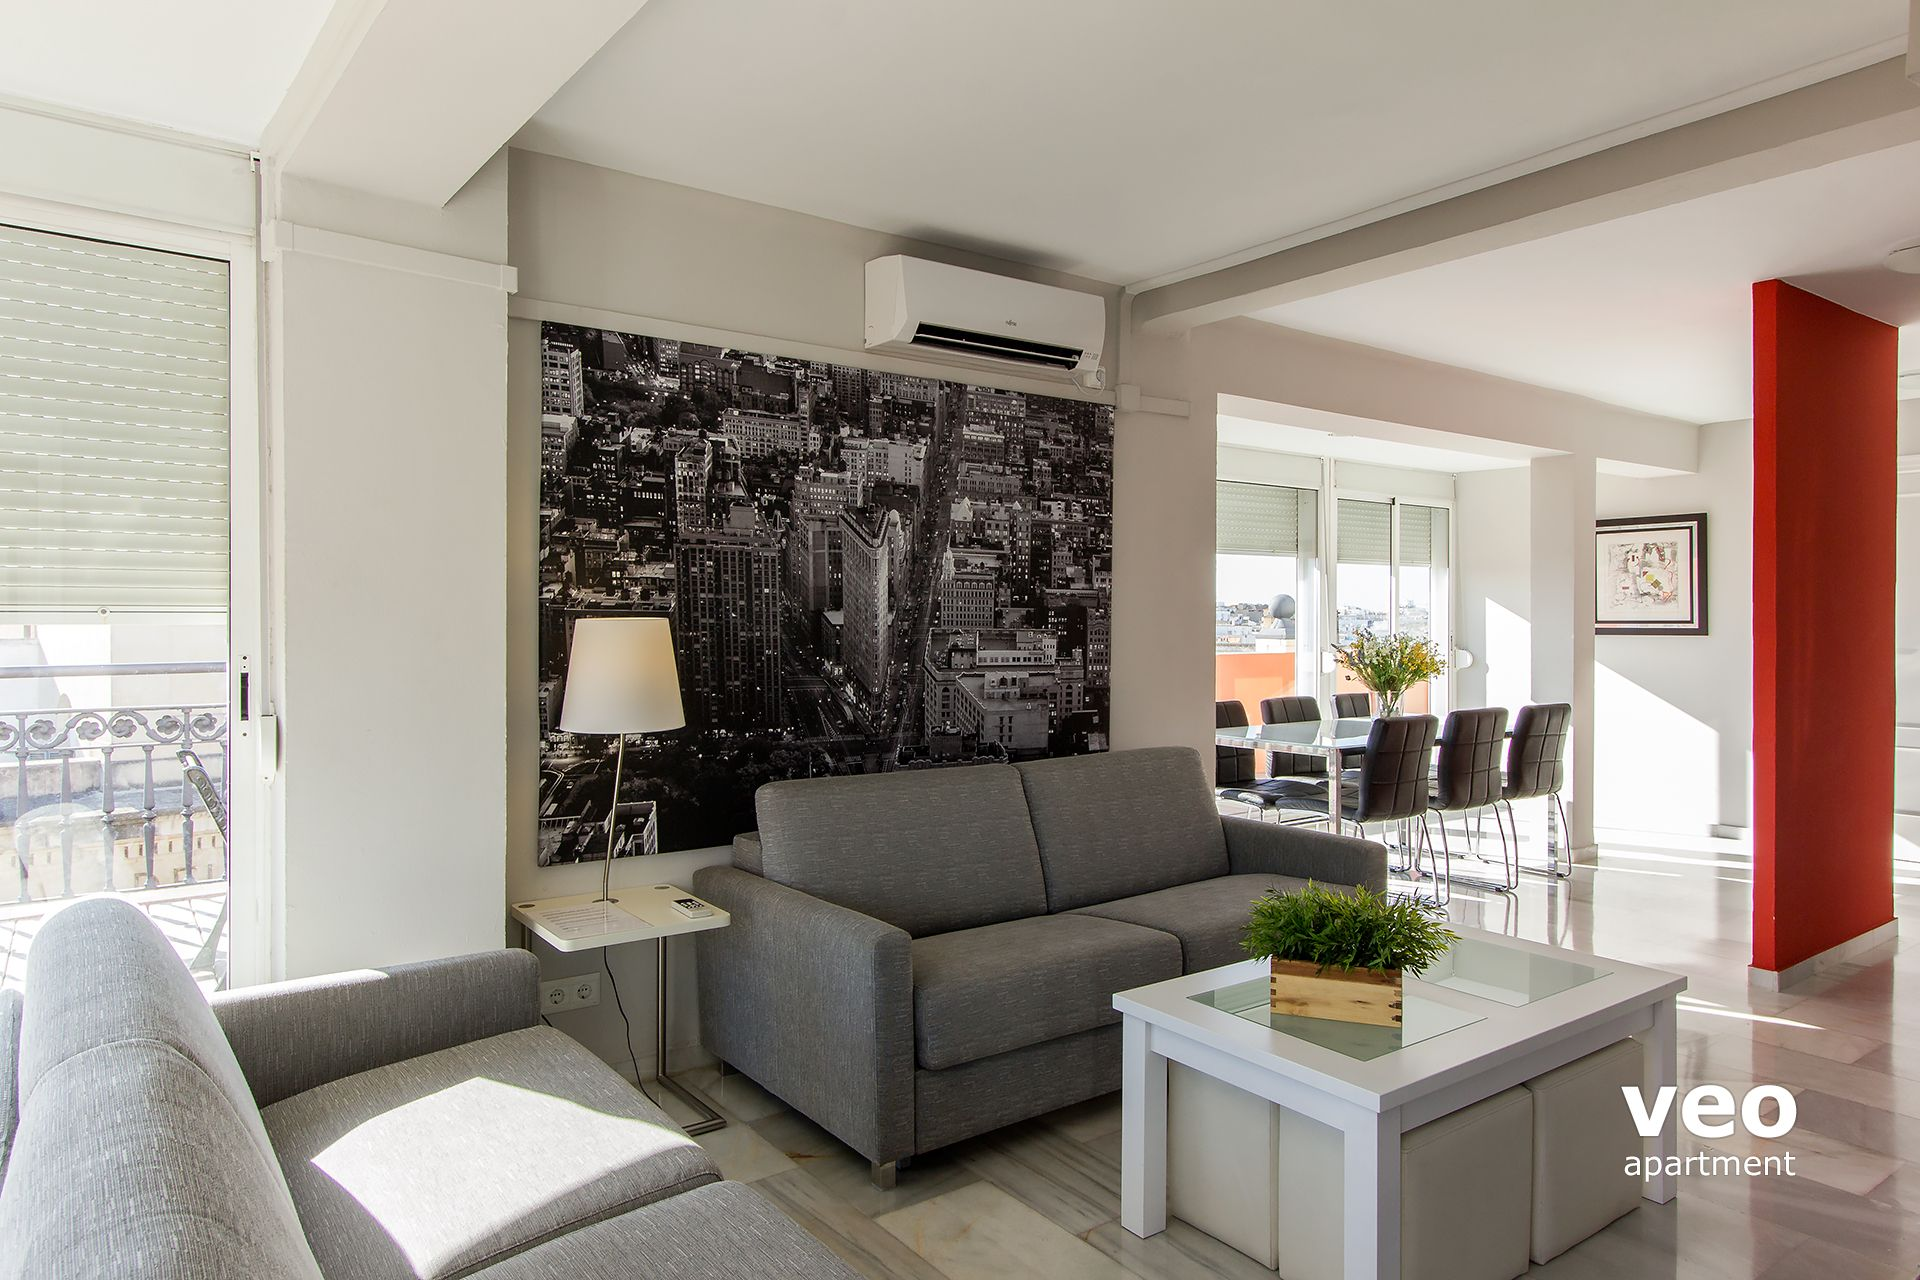 Granada Apartment Adolfo Rodriguez Jurado Street Granada Spain